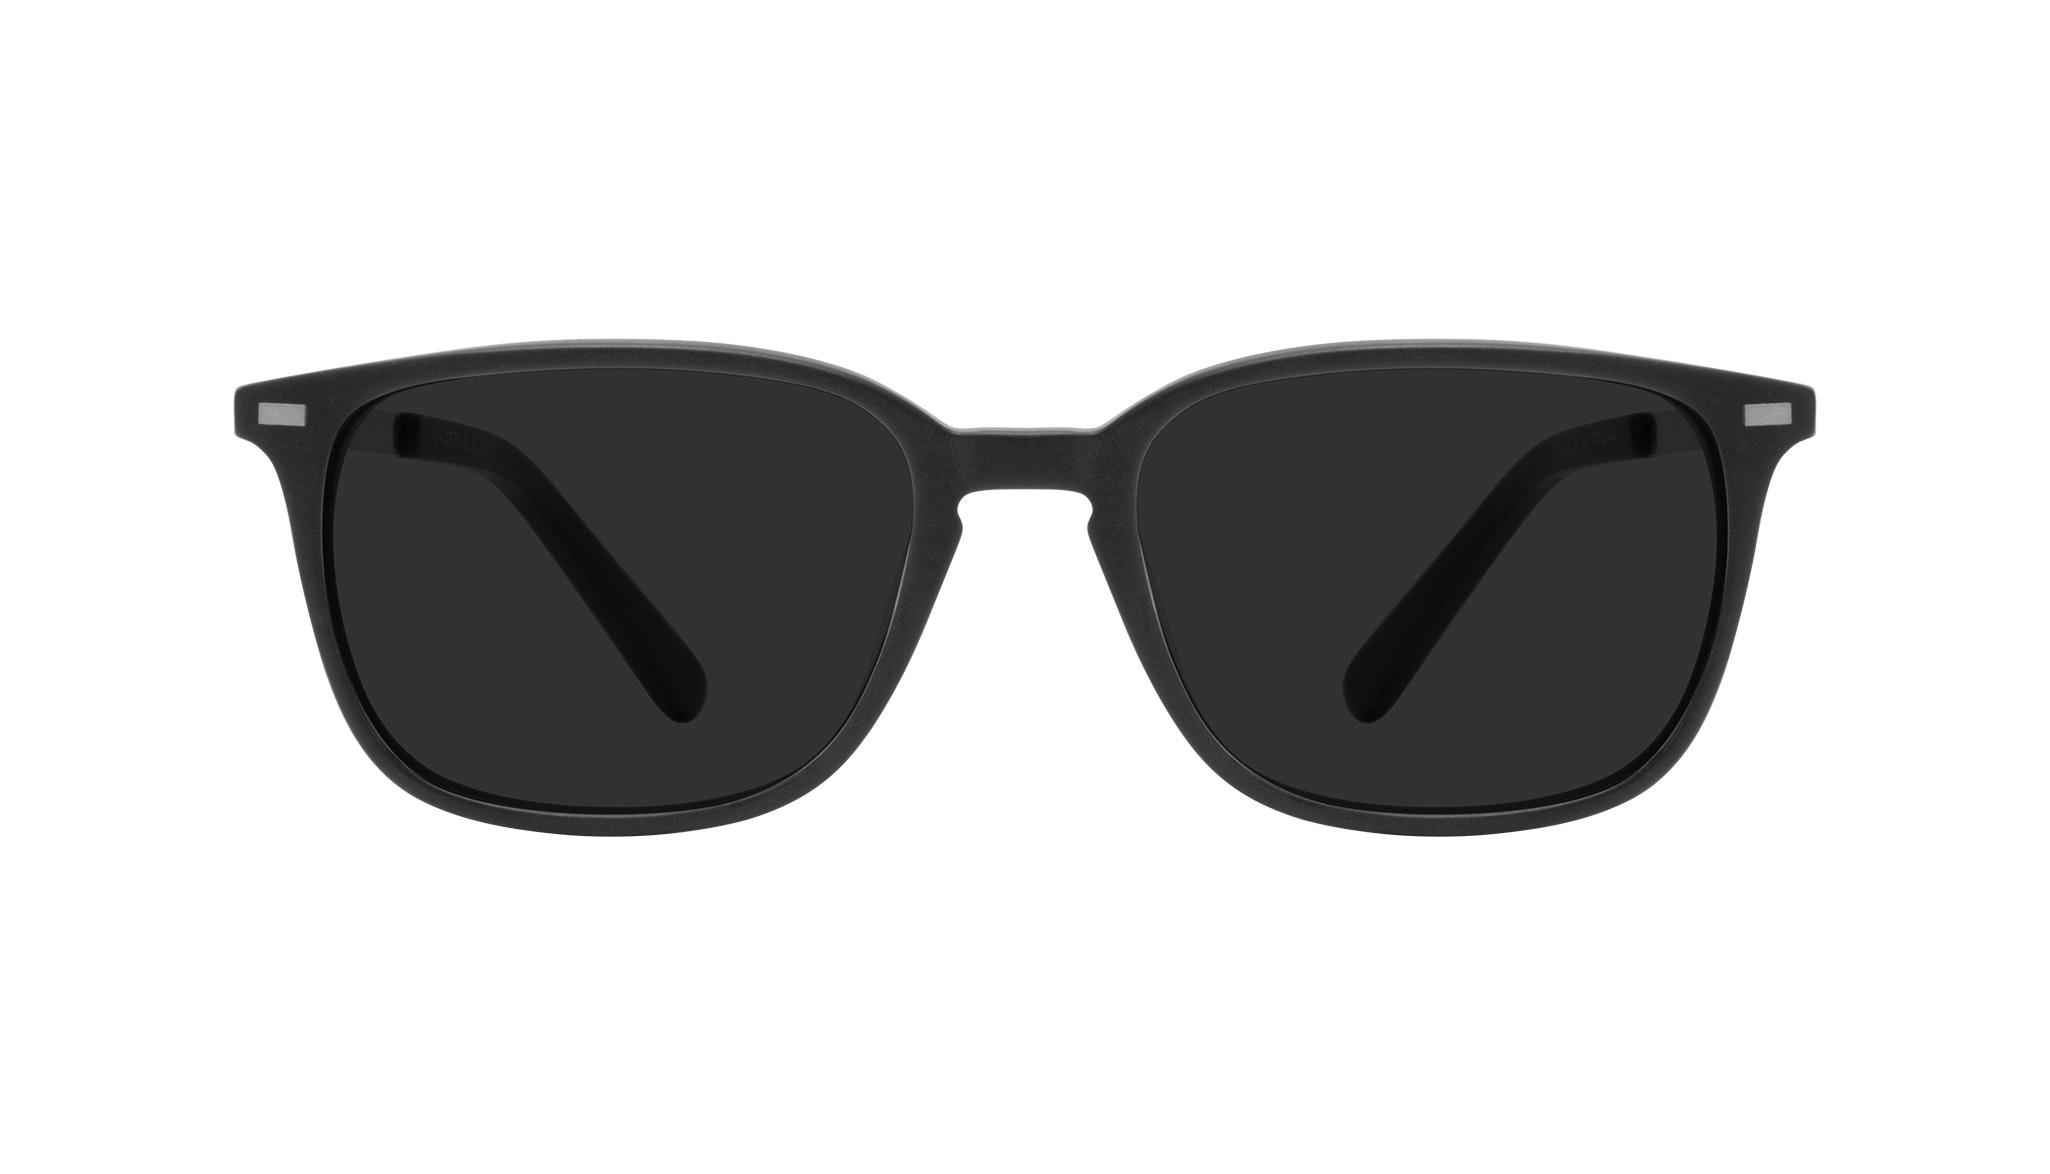 Affordable Fashion Glasses Rectangle Sunglasses Men Sharp Matte Black Front